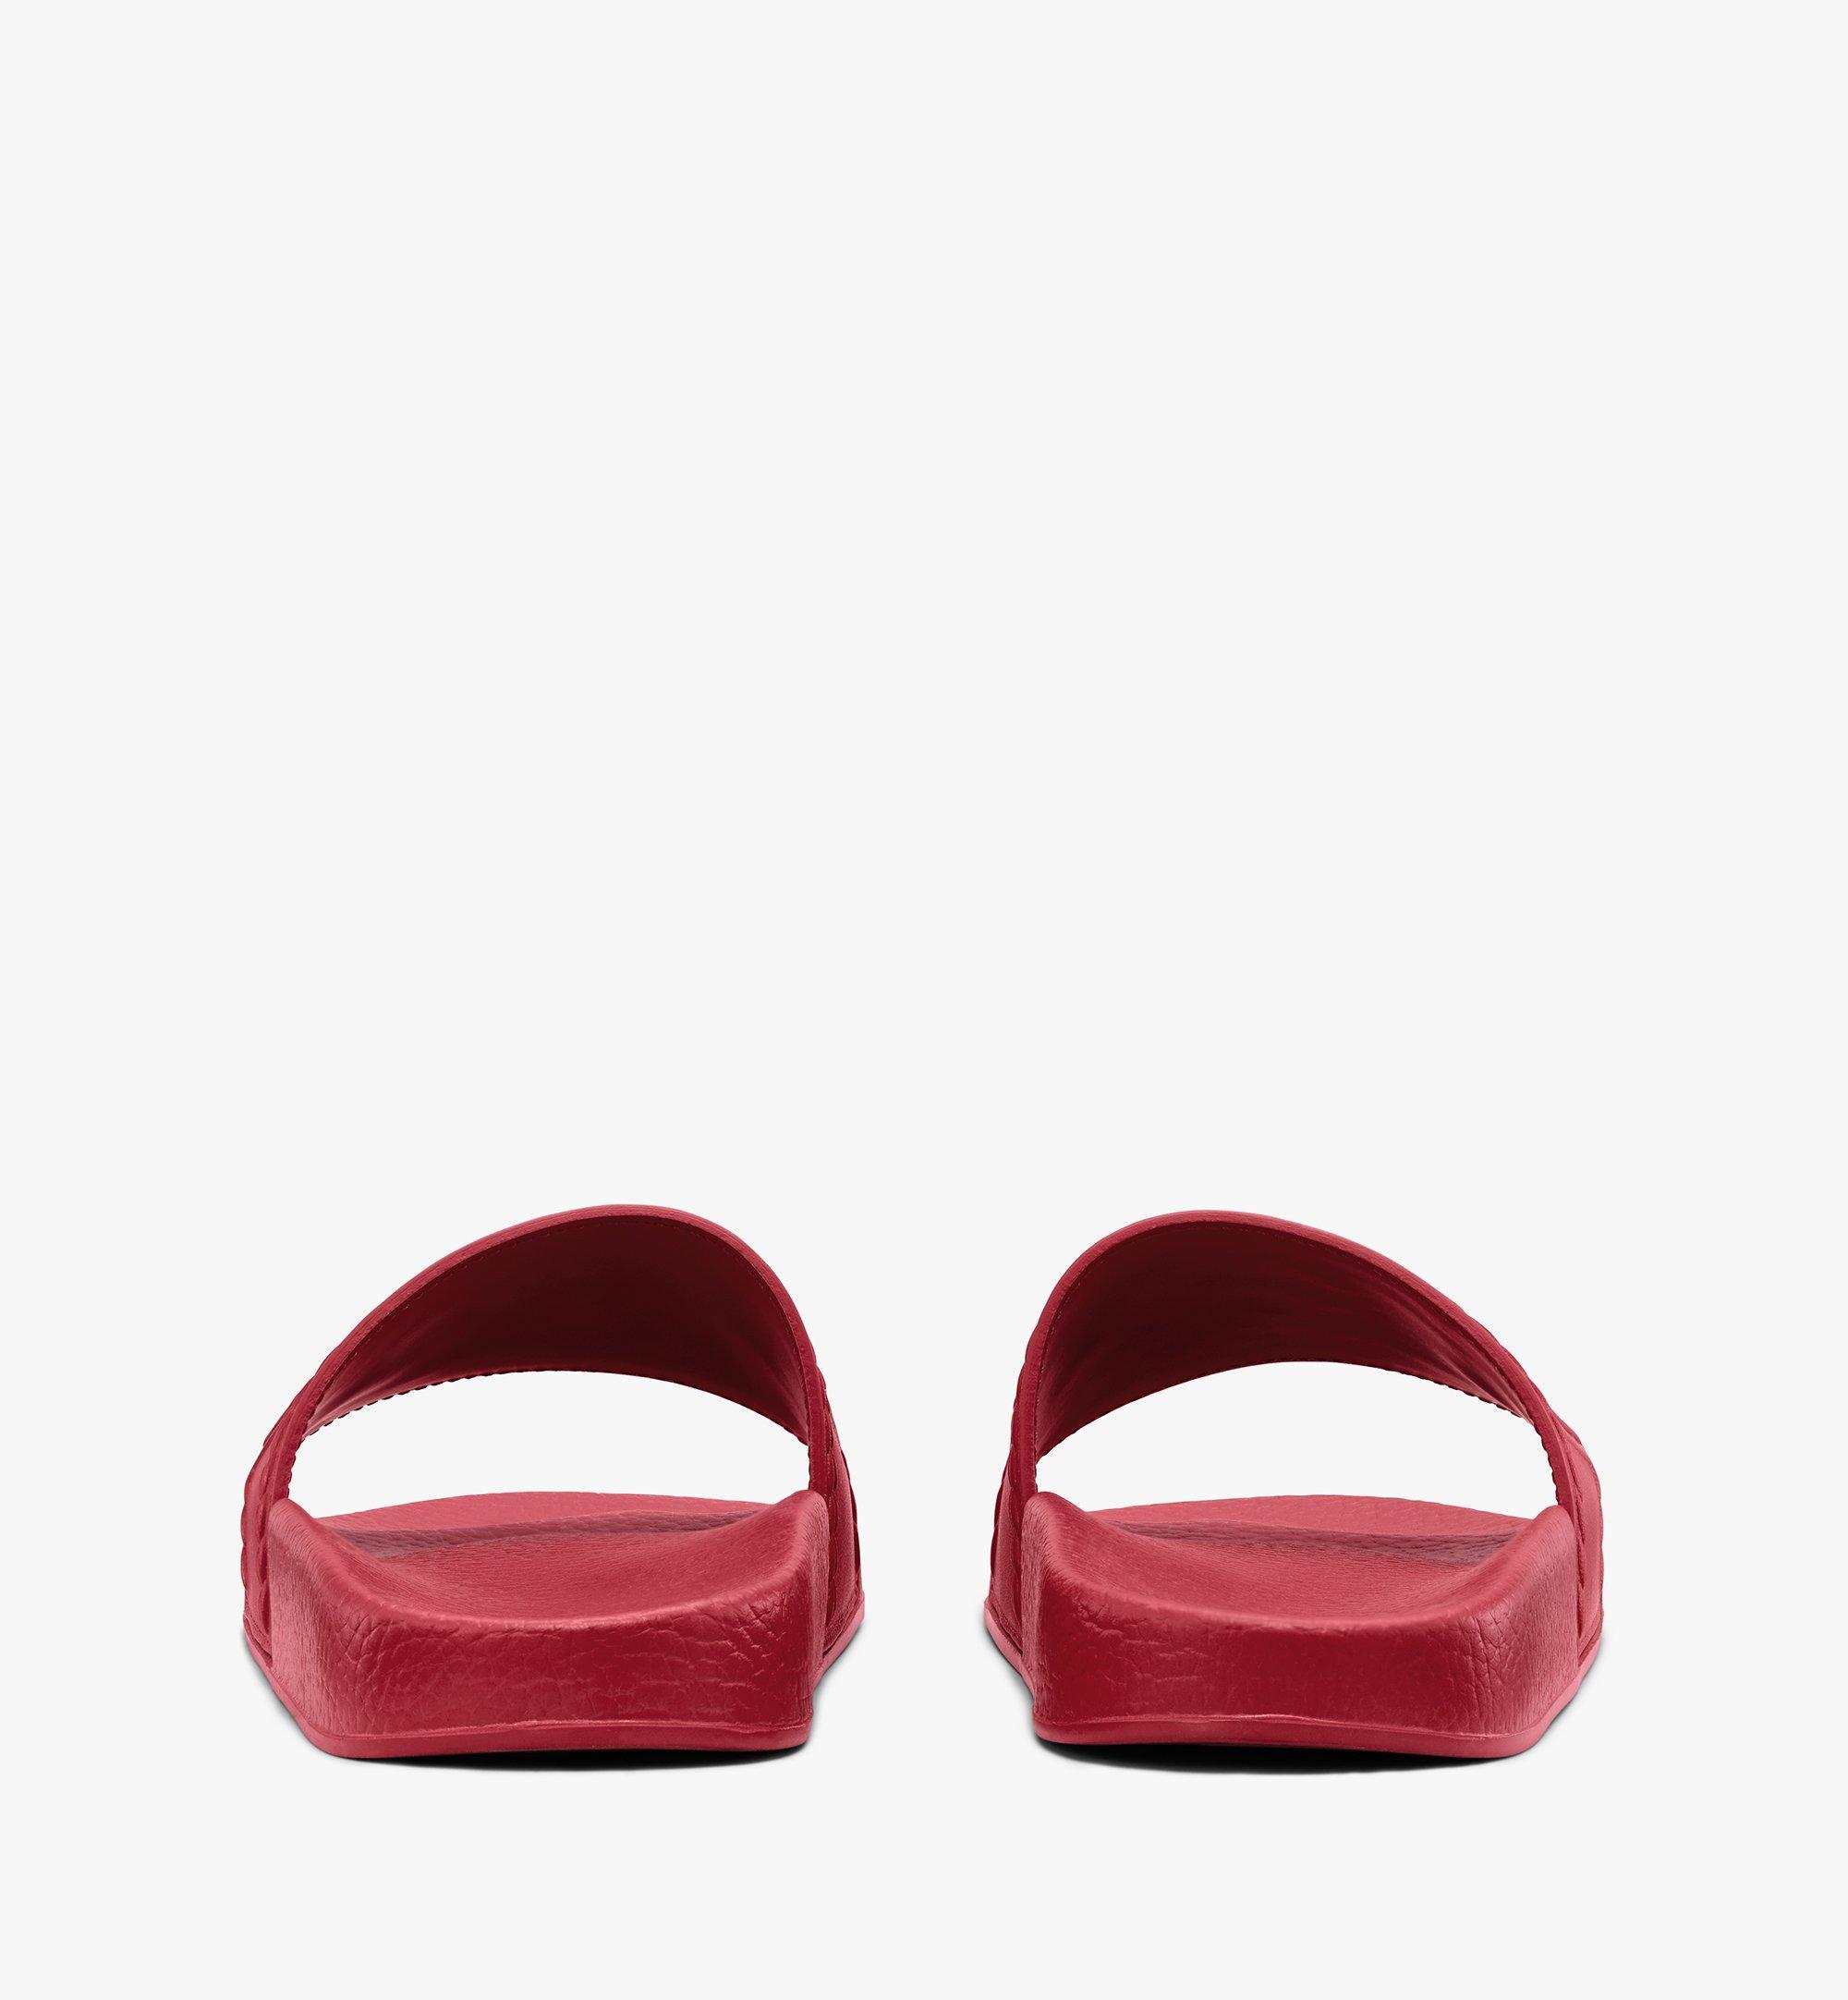 MCM 男士Big Logo拖鞋 Red MEXASMM21R4041 更多视角 2